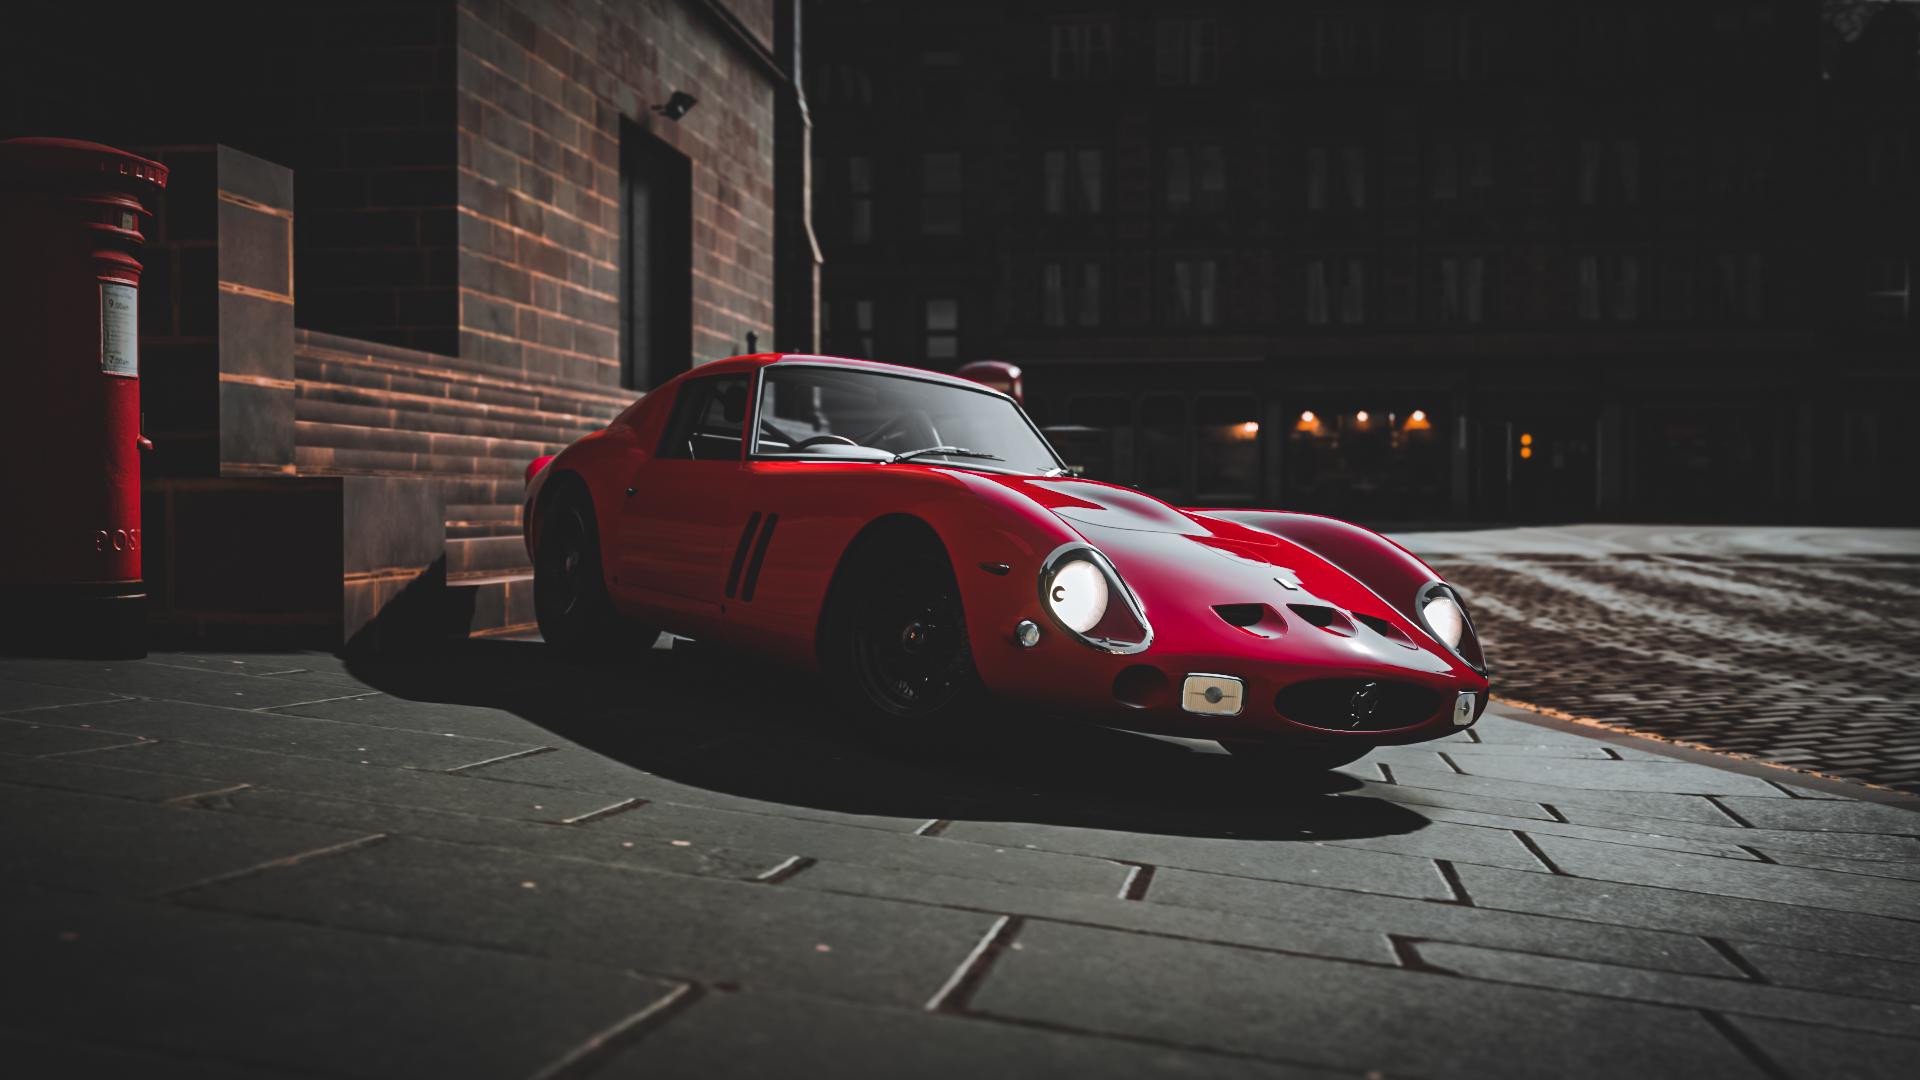 Wallpaper Ferrari 250 Gto Video Games Car Vehicle Forza Horizon 4 1920x1080 Fple 1832175 Hd Wallpapers Wallhere